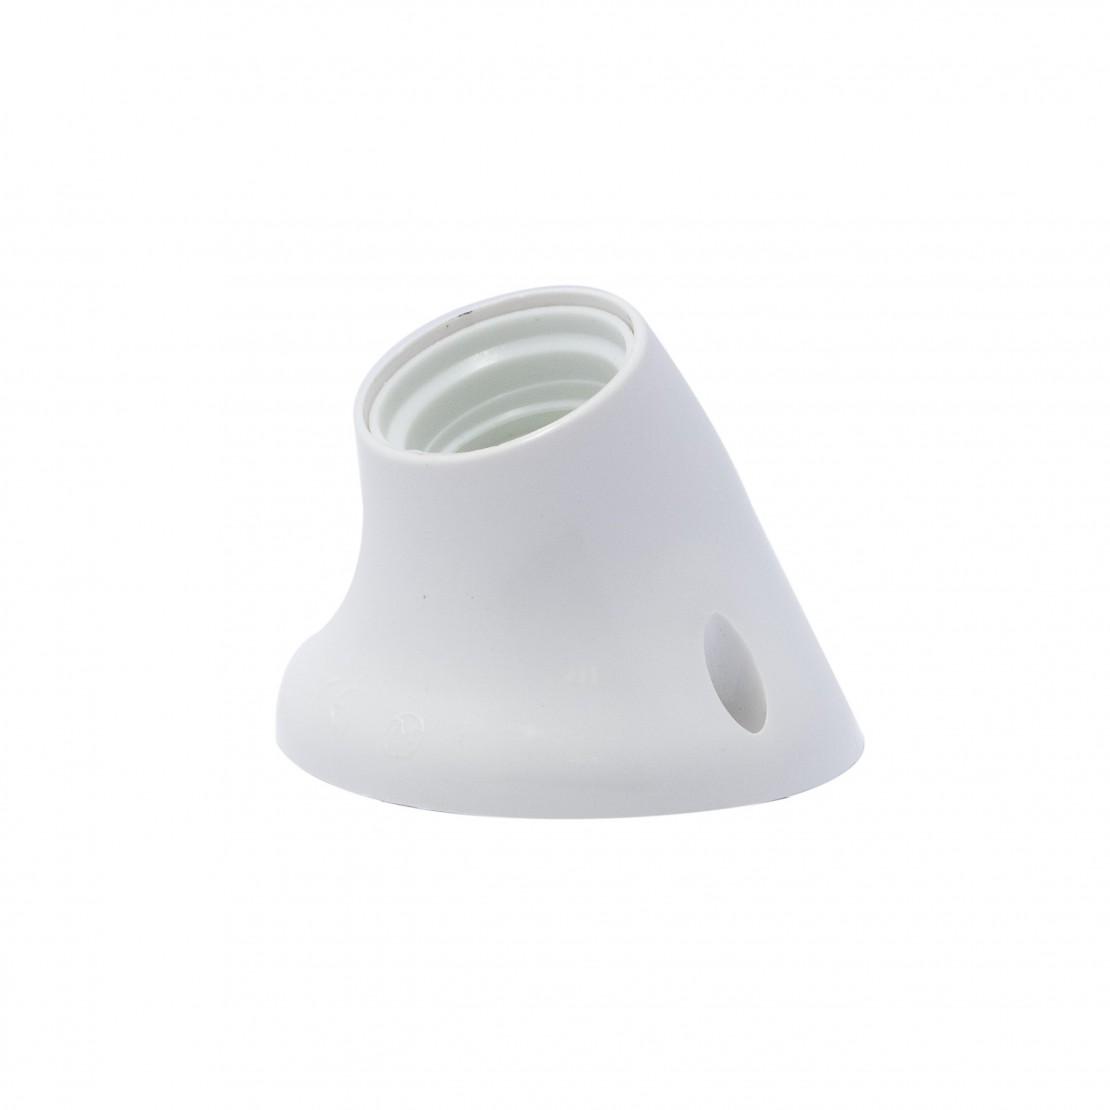 Angled wall light, white - E27 bulb